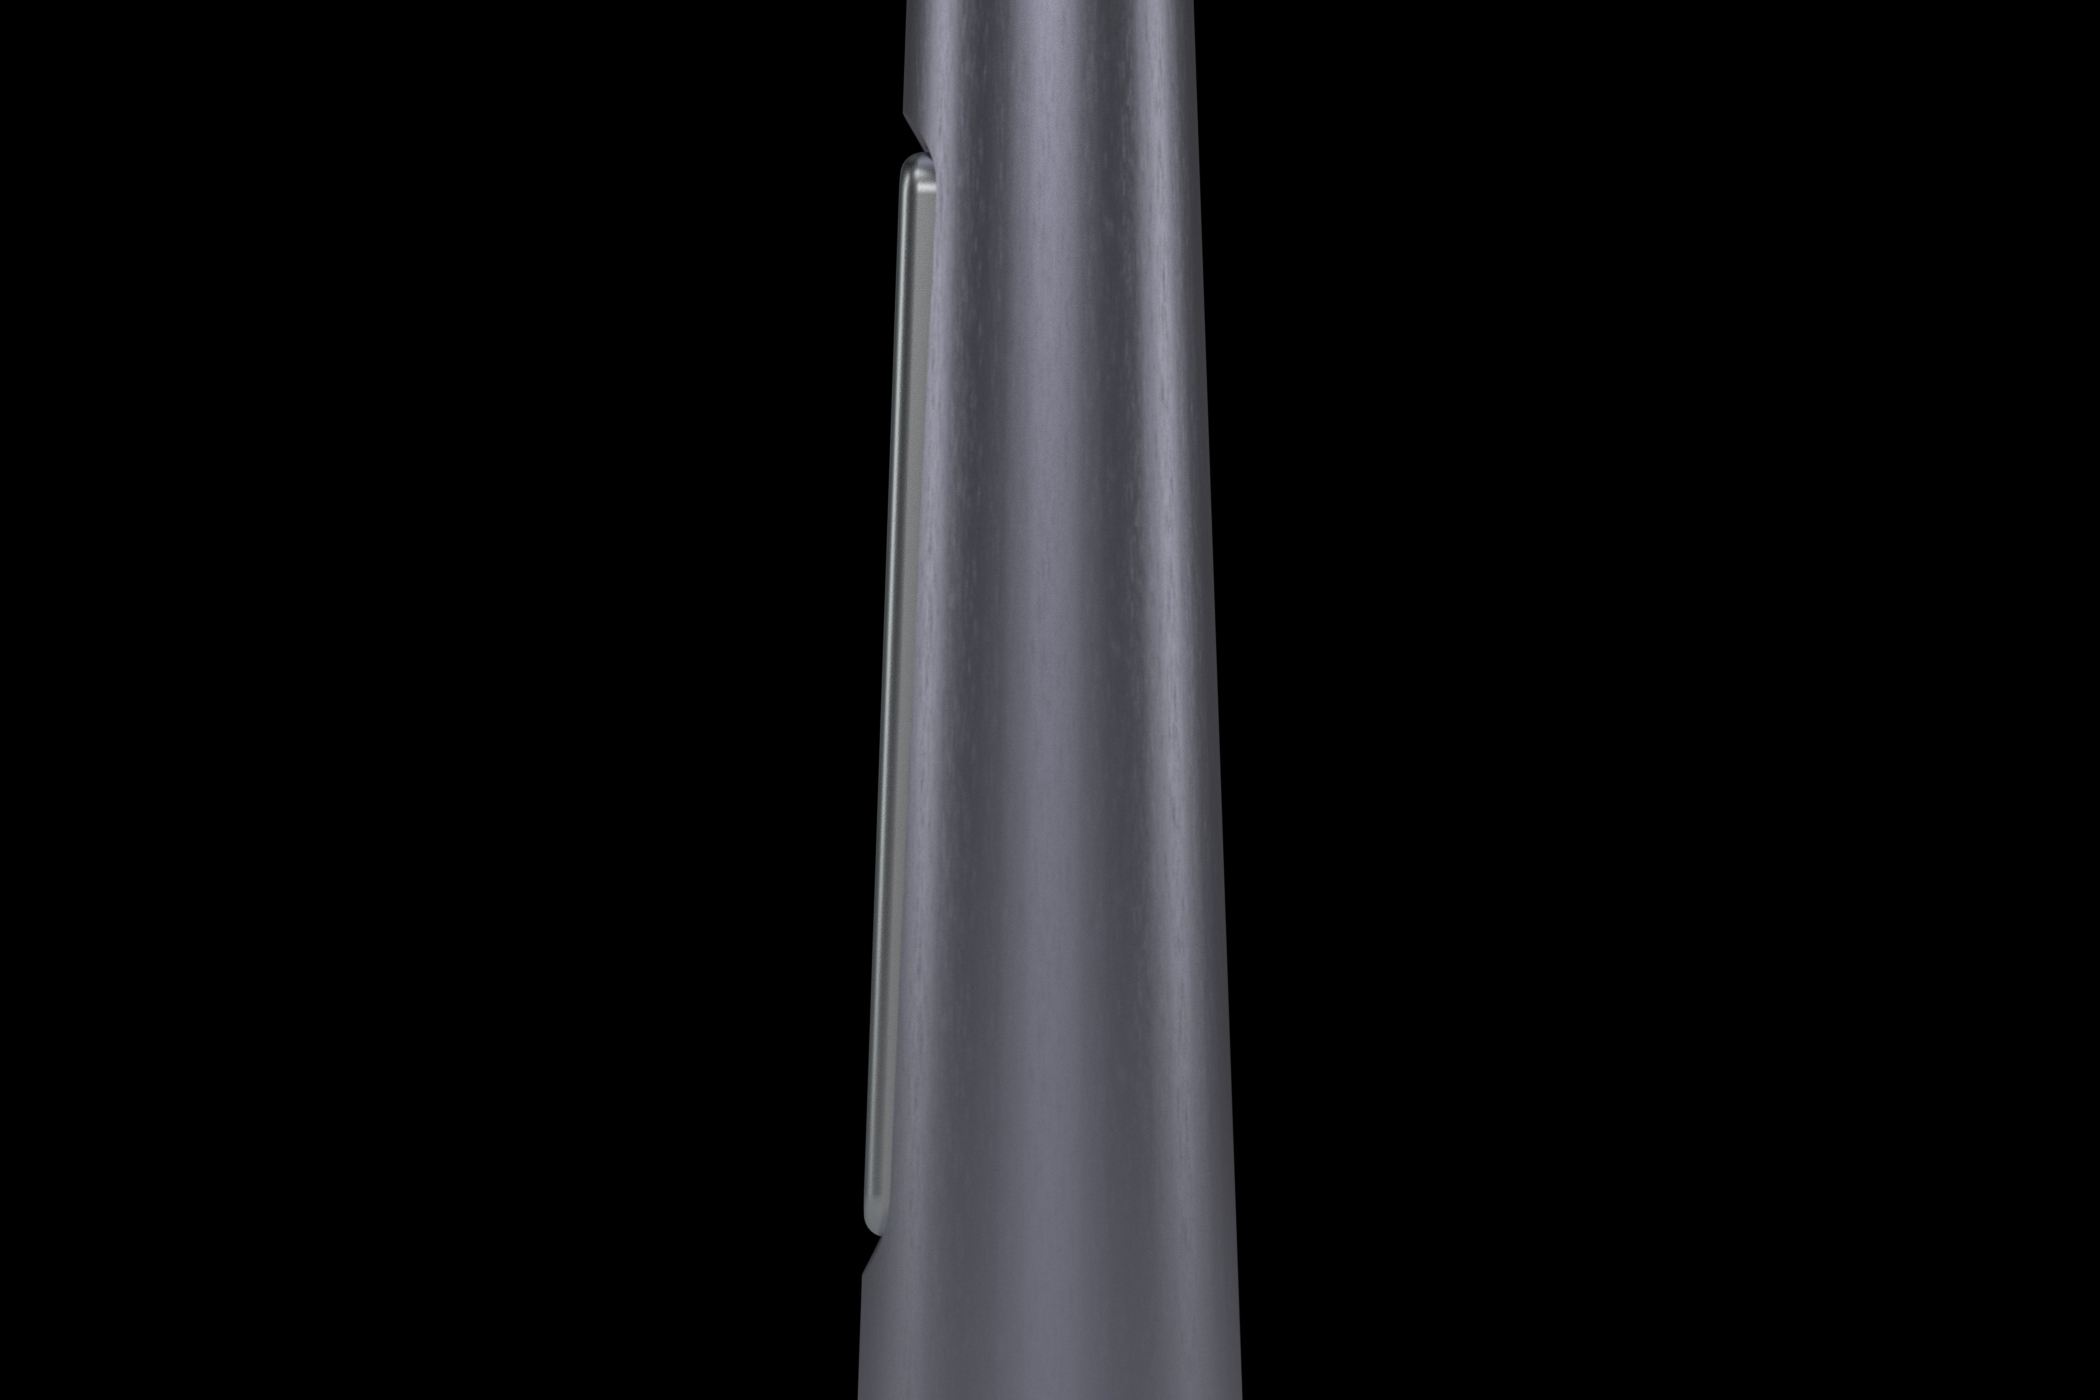 27032020-2